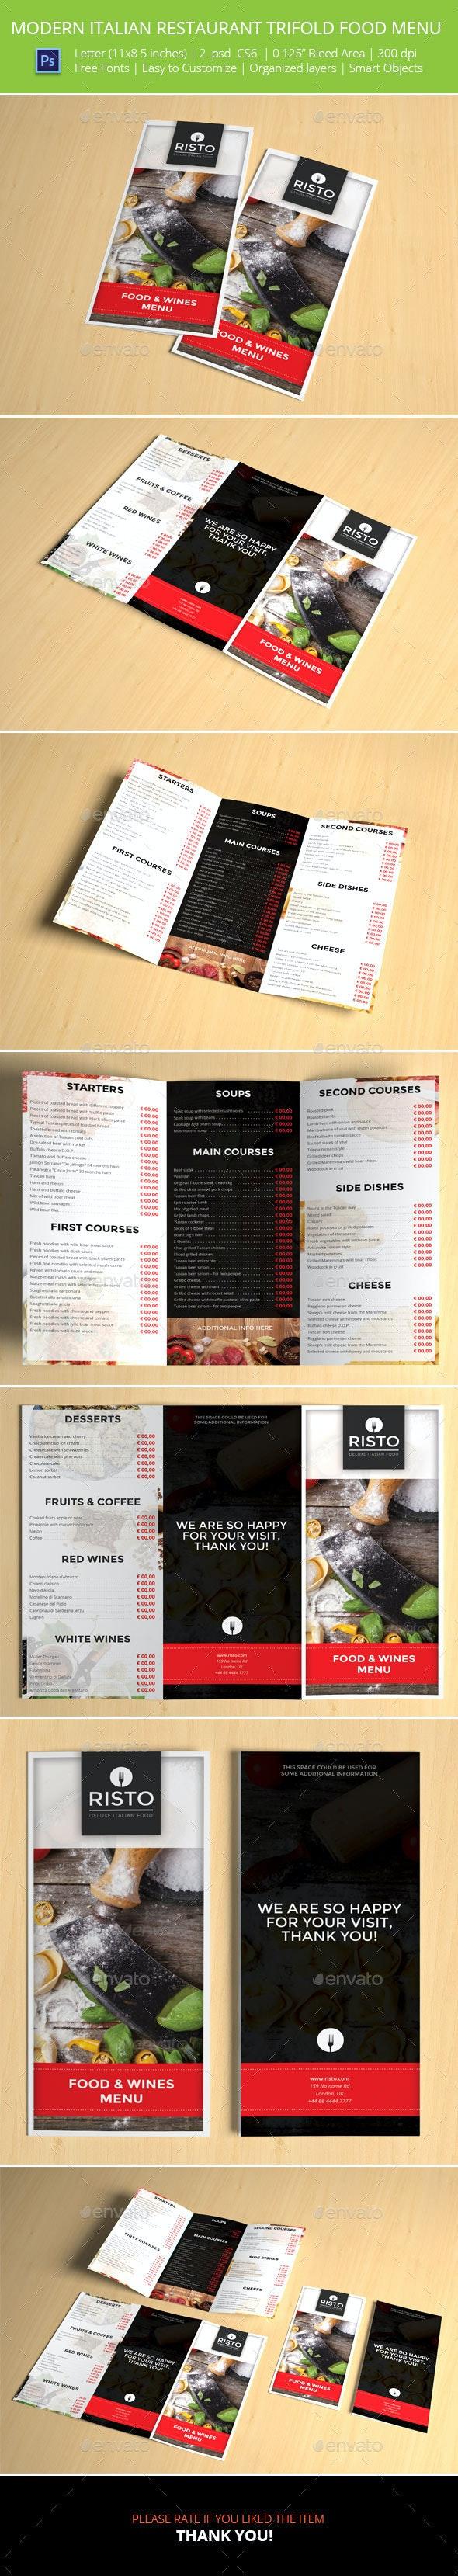 Modern Italian Restaurant Trifold Food Menu - Food Menus Print Templates